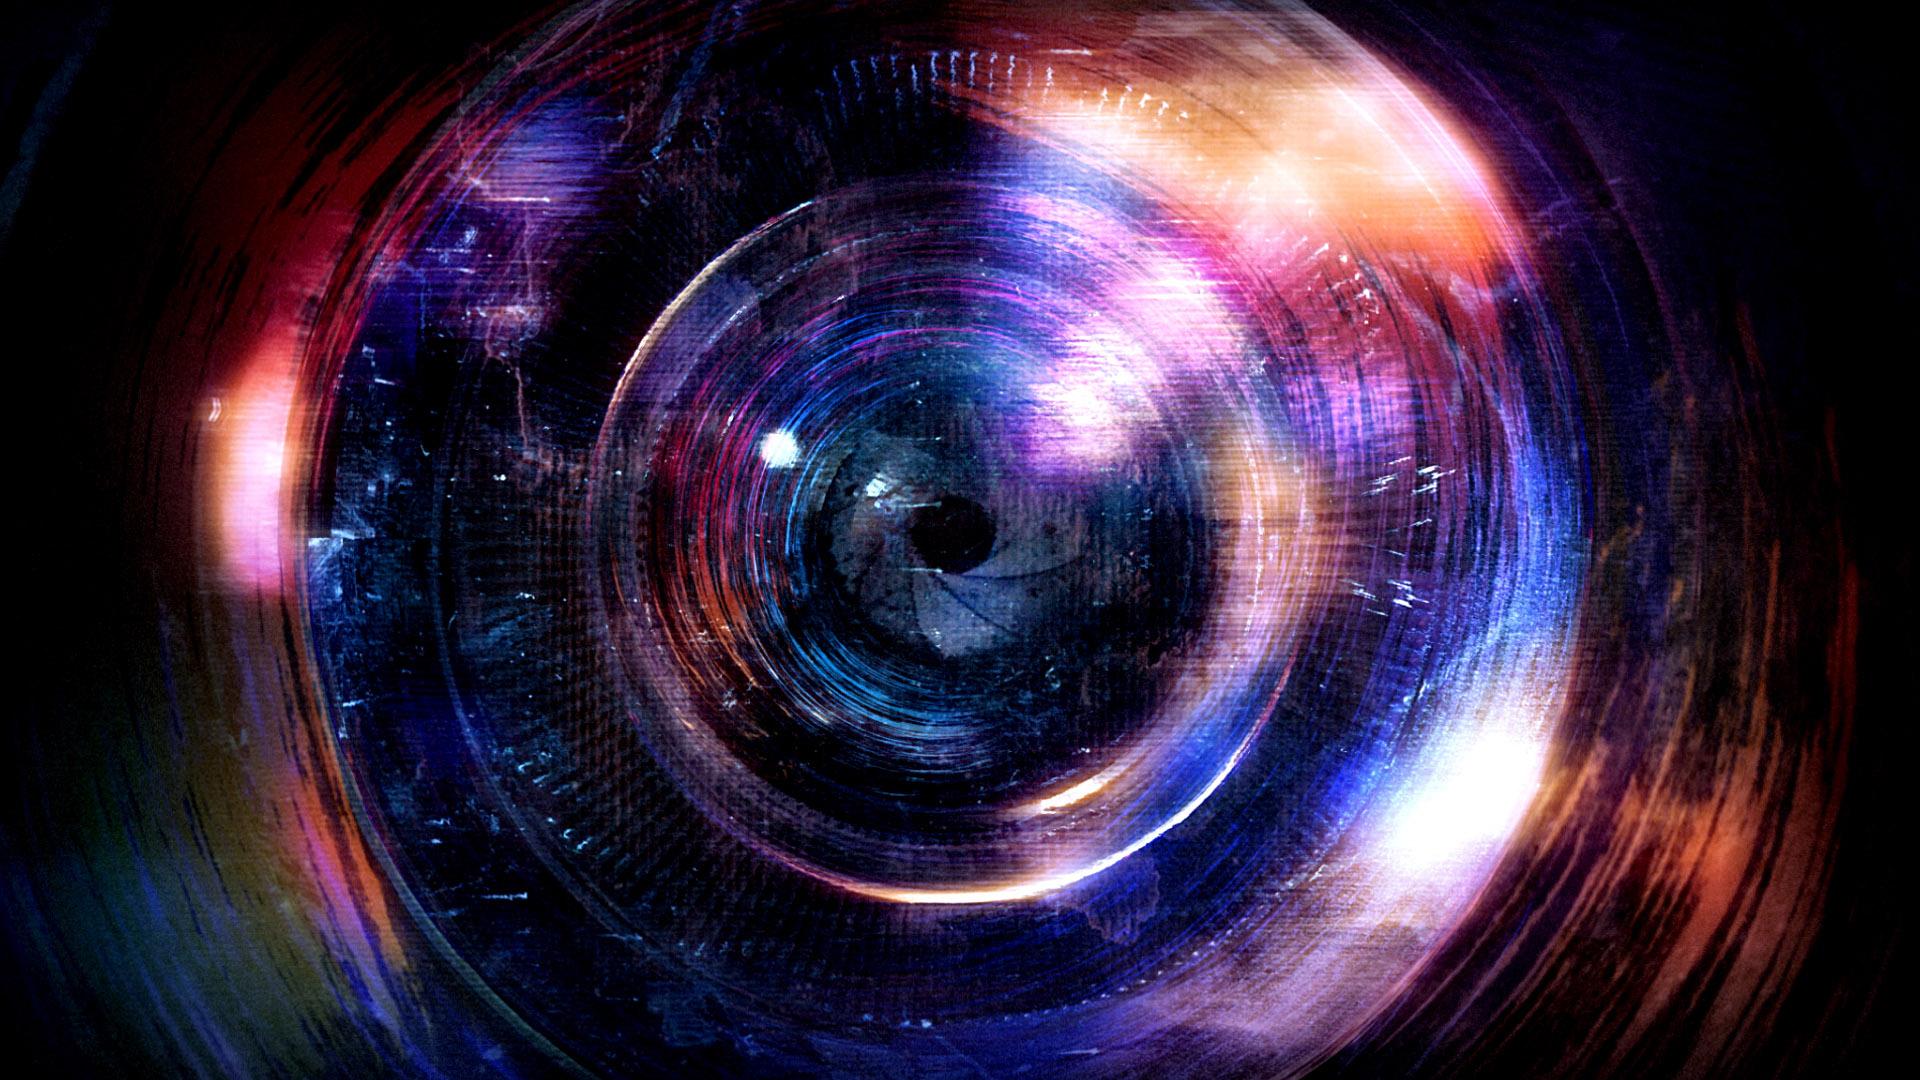 AKA_Teaser_Dreams_Texted_PreLaunch_Stereo_ProResHQ (00370)_web.jpg